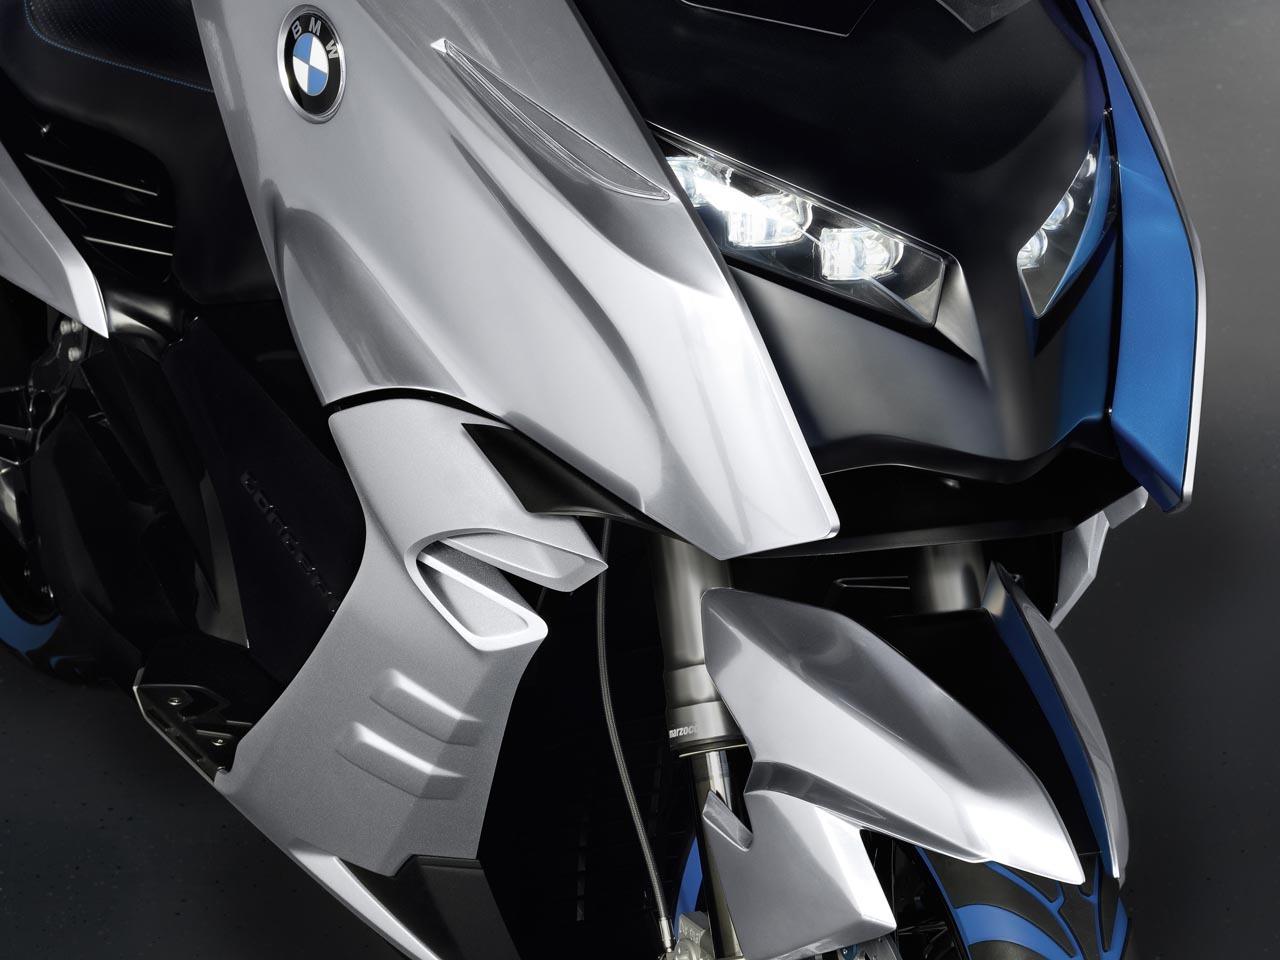 Foto de BMW Concept C Scooter, el Scooter del futuro según BMW (13/19)